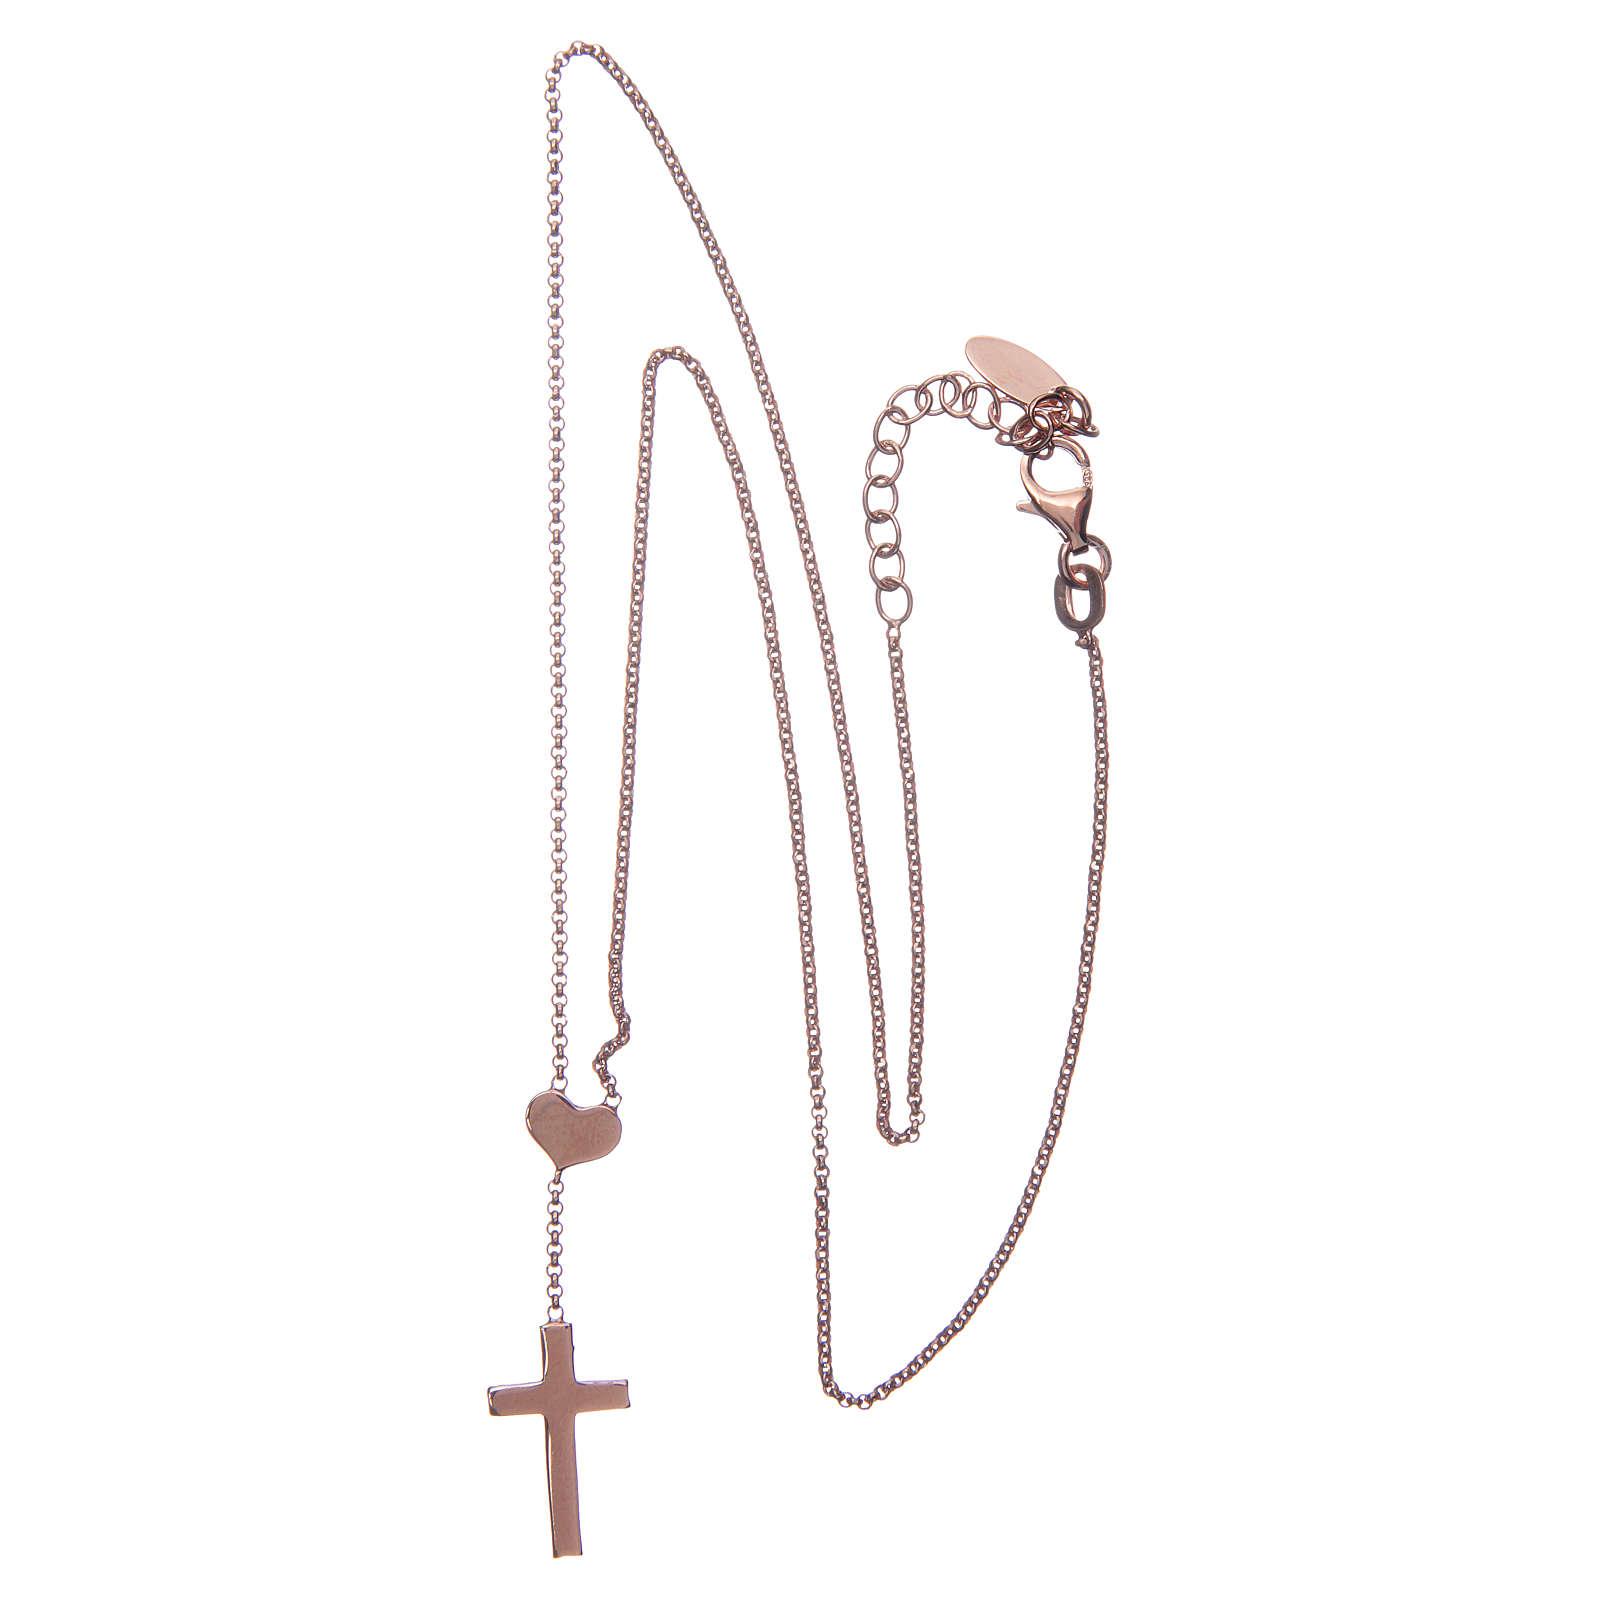 Necklace AMEN Heart and Cross silver 925 Rosè finish 4